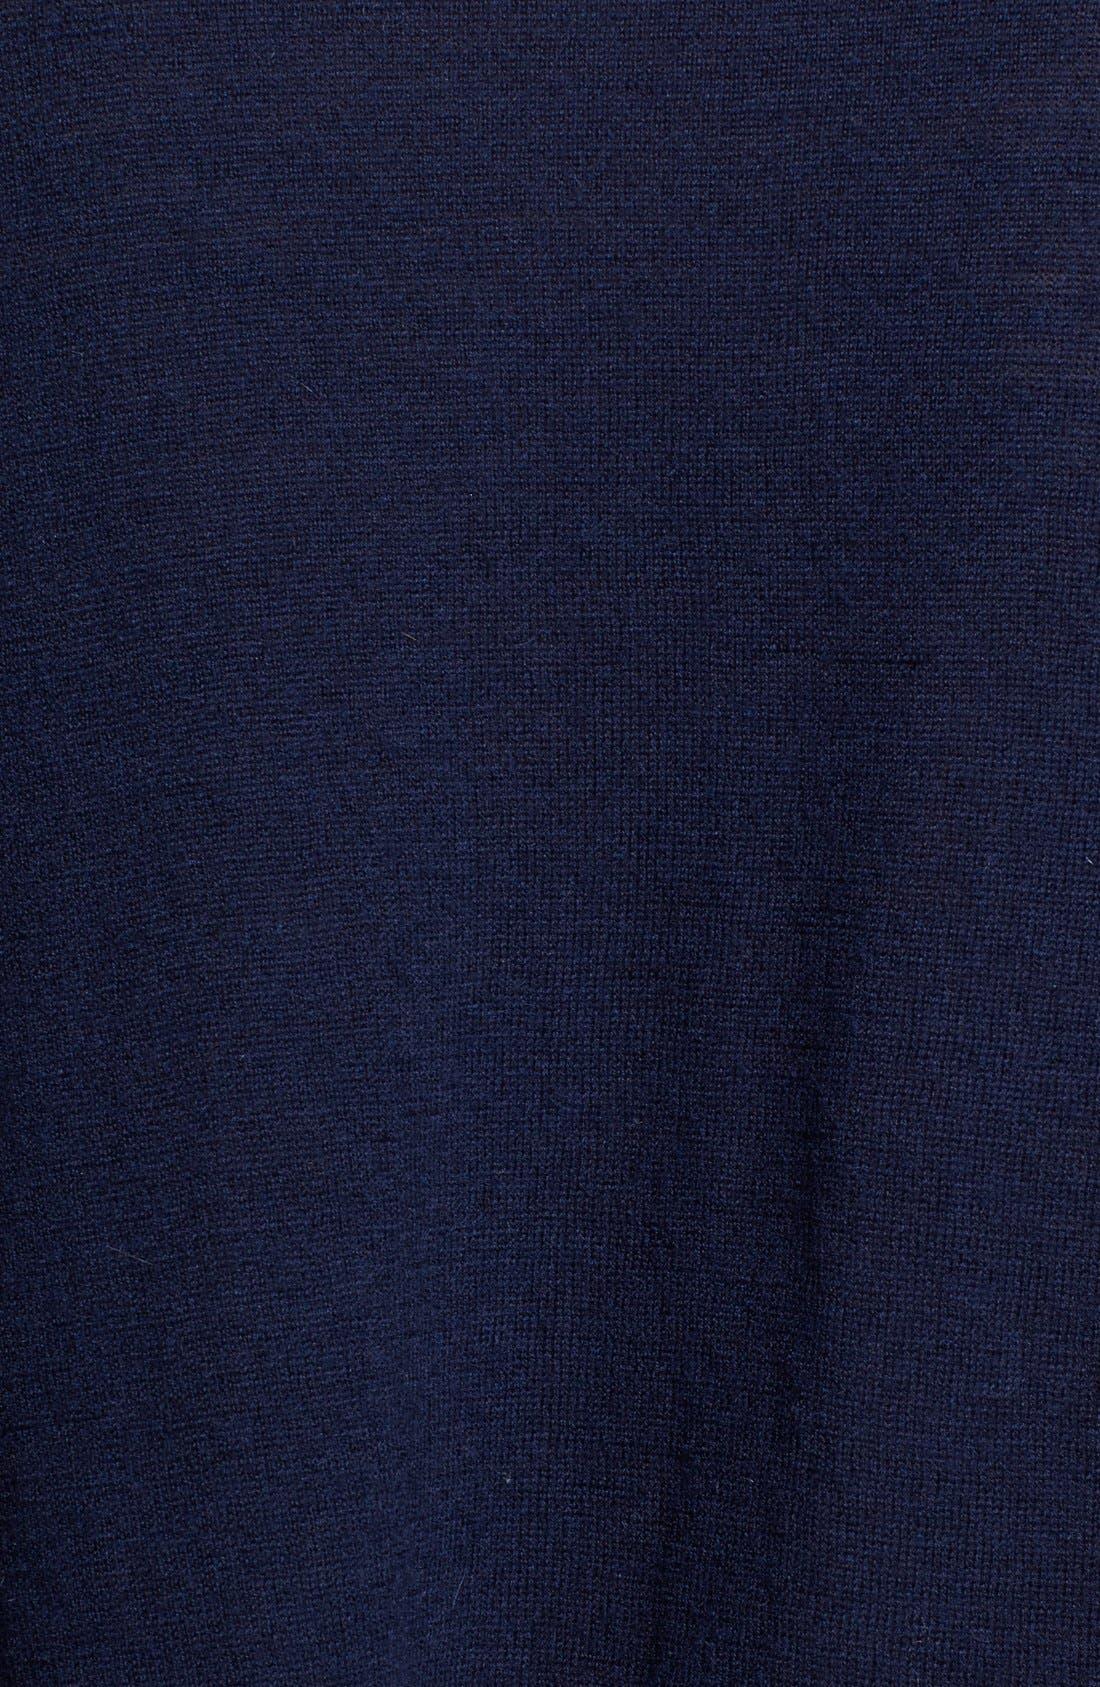 Alternate Image 3  - autumn cashmere Drop Shoulder Asymmetrical Cashmere Sweater